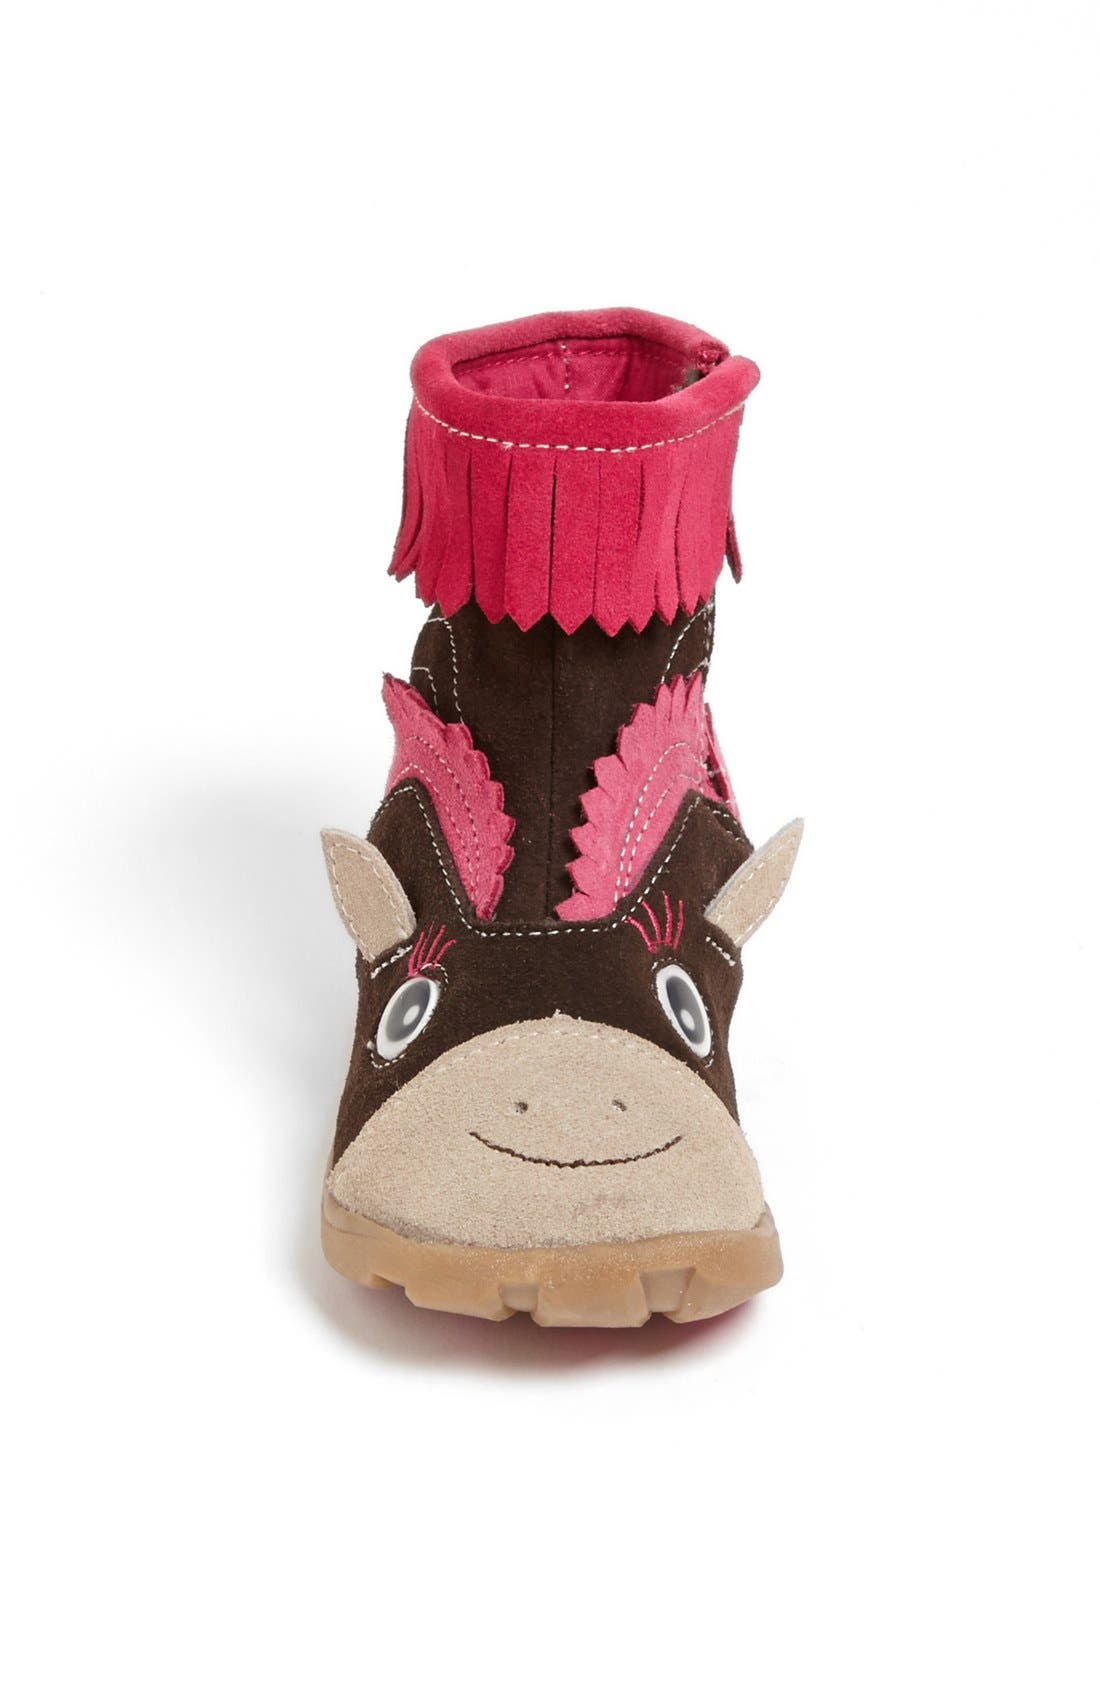 Alternate Image 3  - Zooligans 'Paloma the Pony' Boot (Baby, Walker, Toddler & Little Kid)